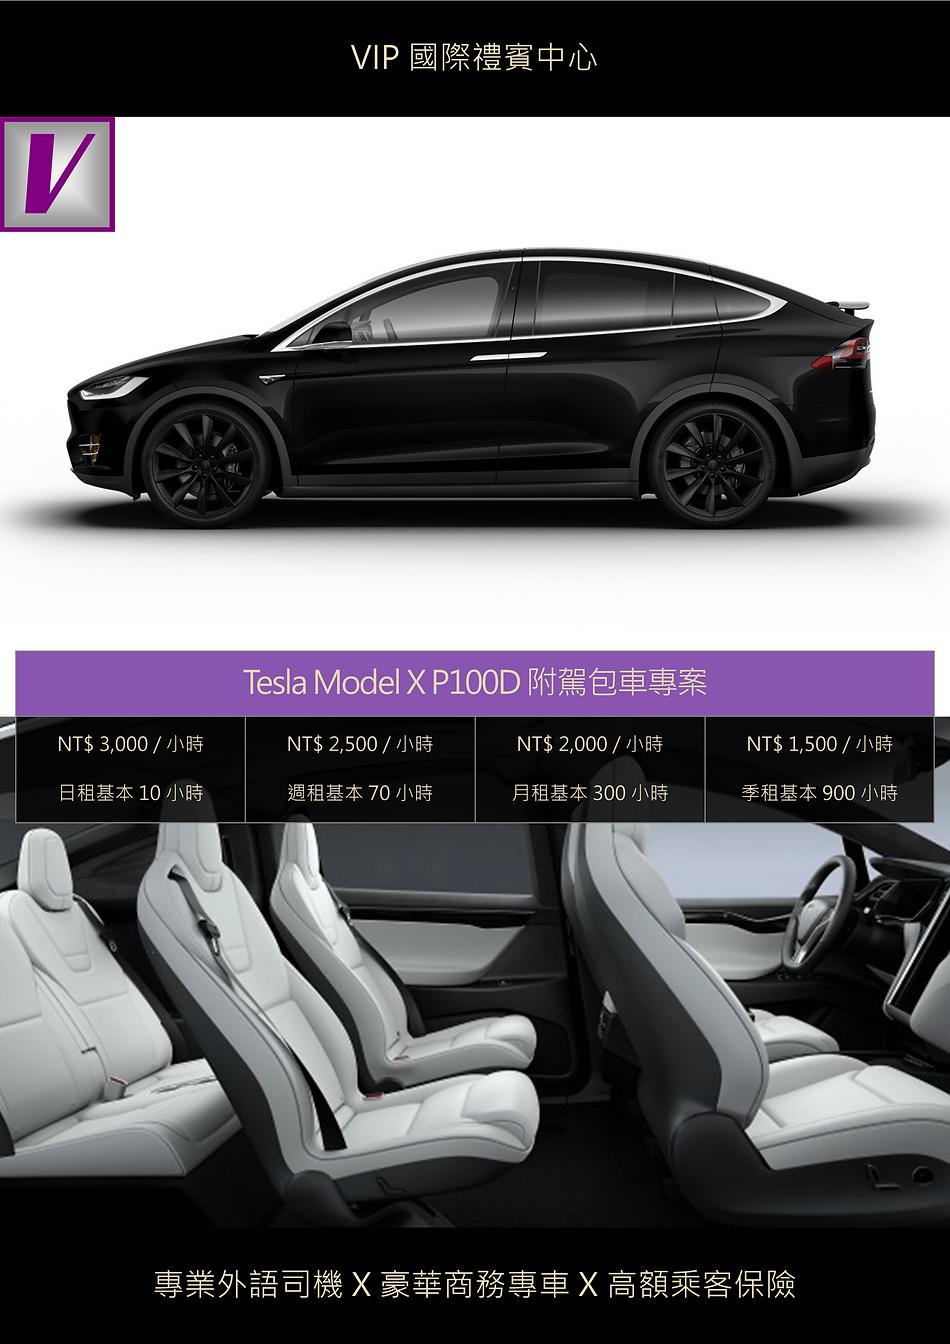 VIP國際禮賓中心 TESLA MODEL X P100D BLACK 附駕包車專案 DM.png